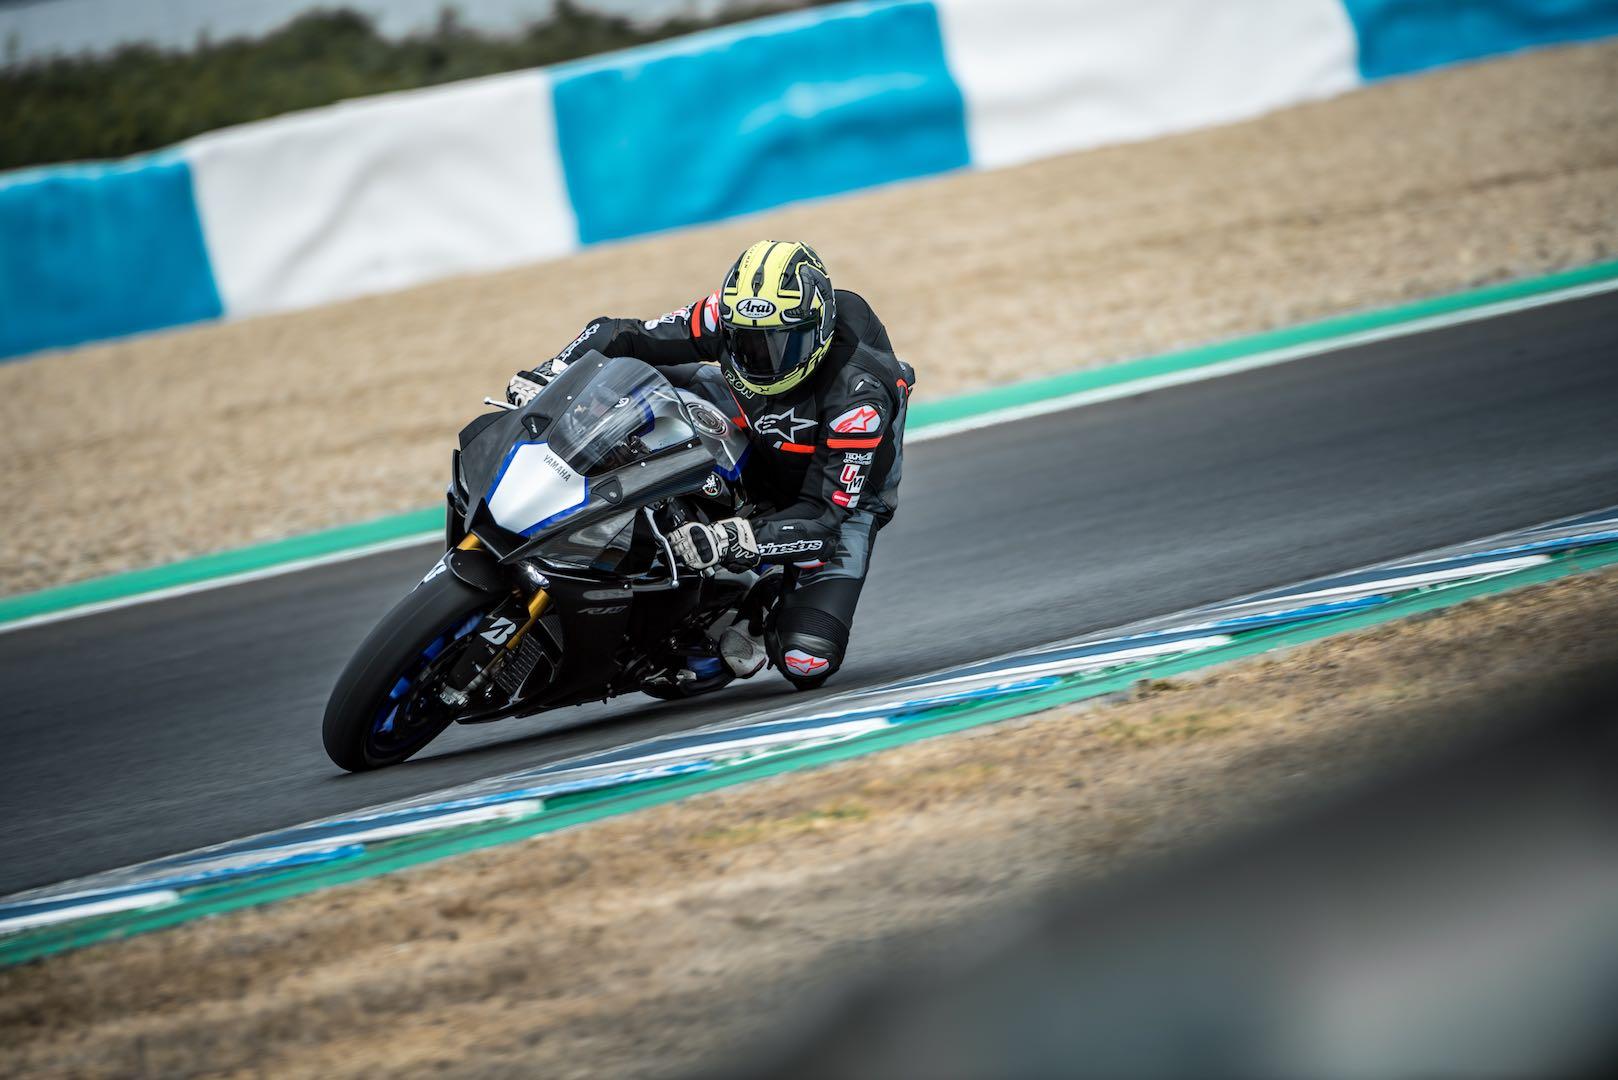 2020 Yamaha R1M Review